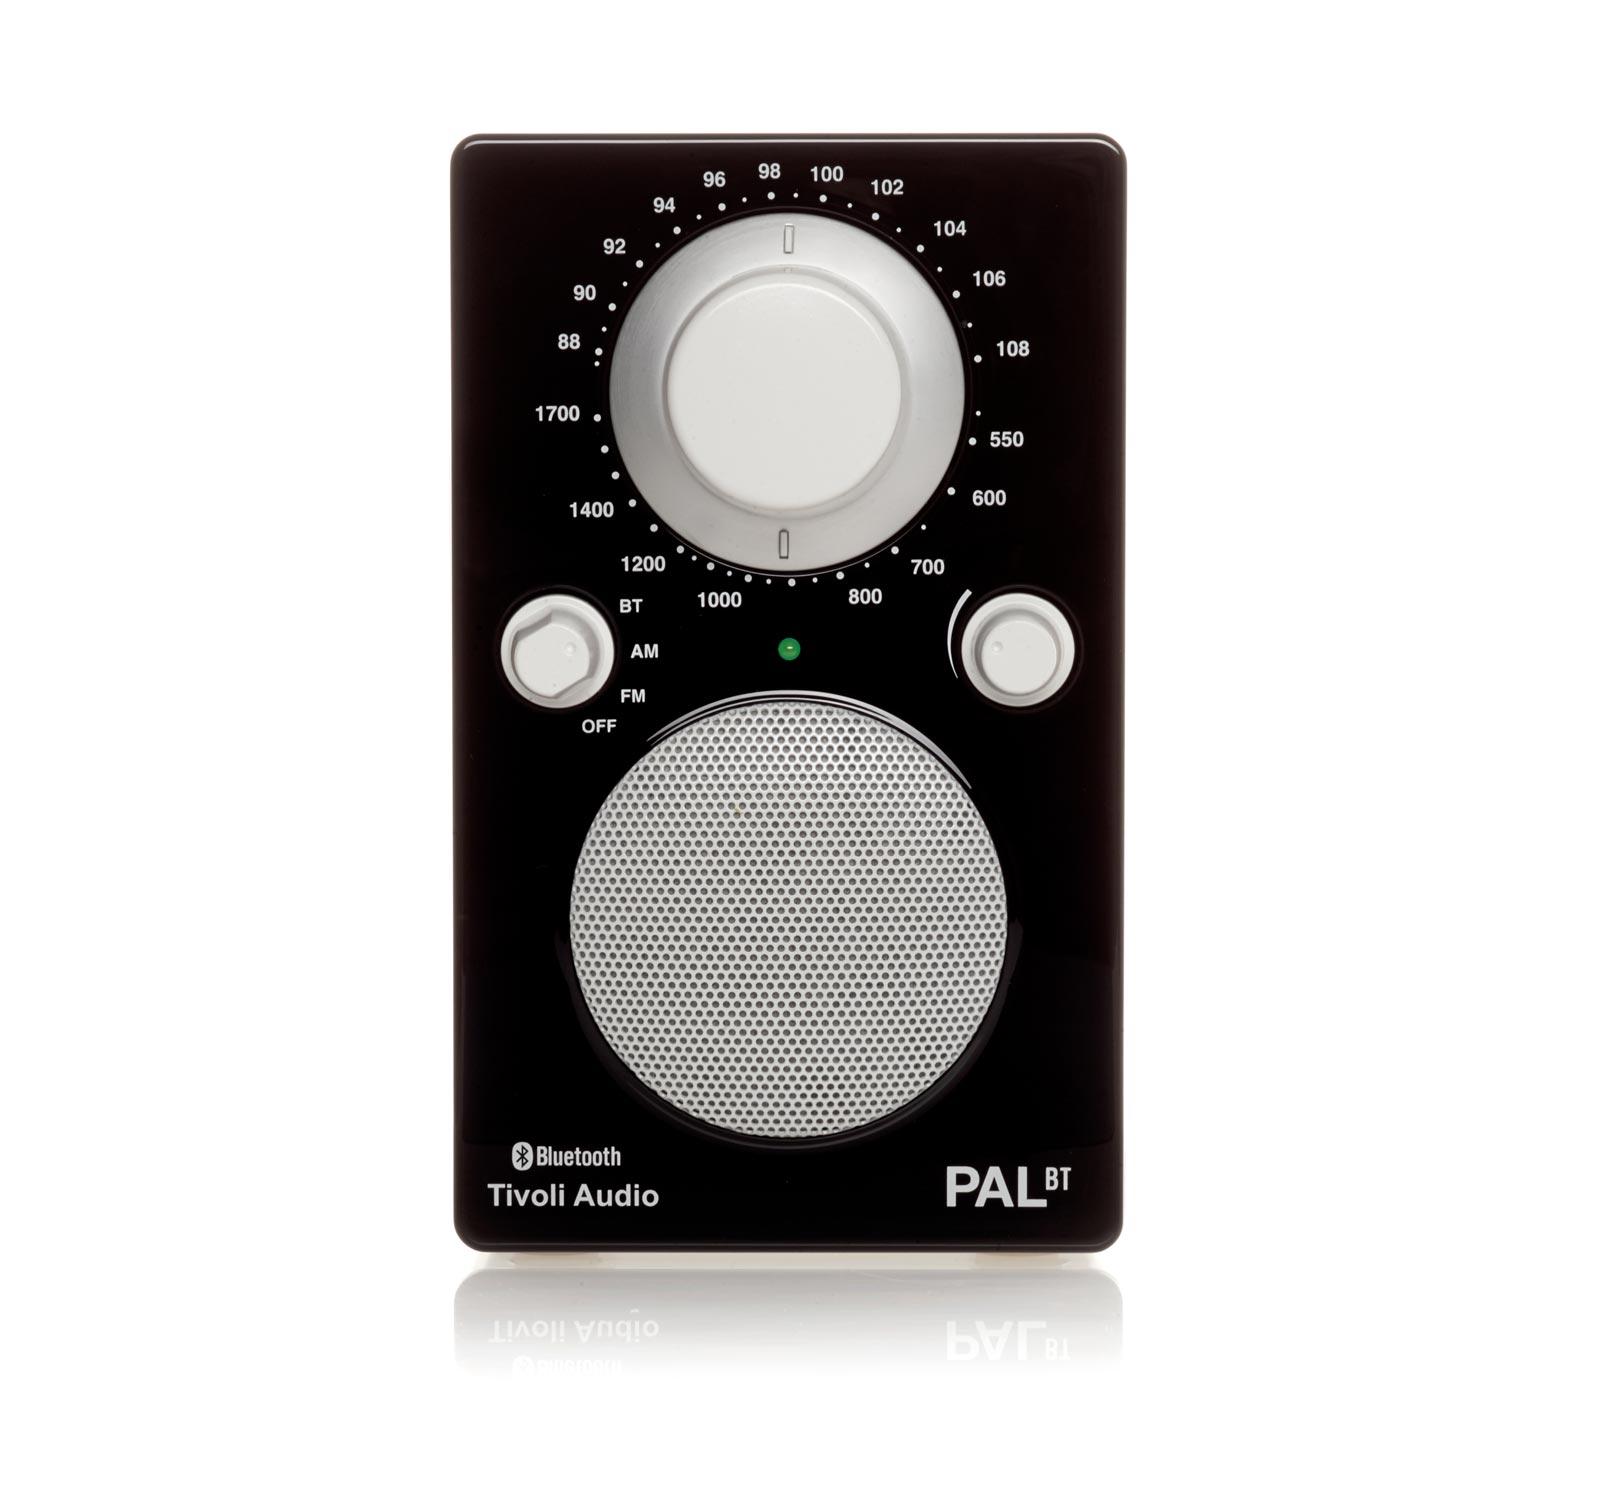 Tivoli PAL BT Black/White - Open Box Portable Bluetooth AM/FM Radio at Sears.com